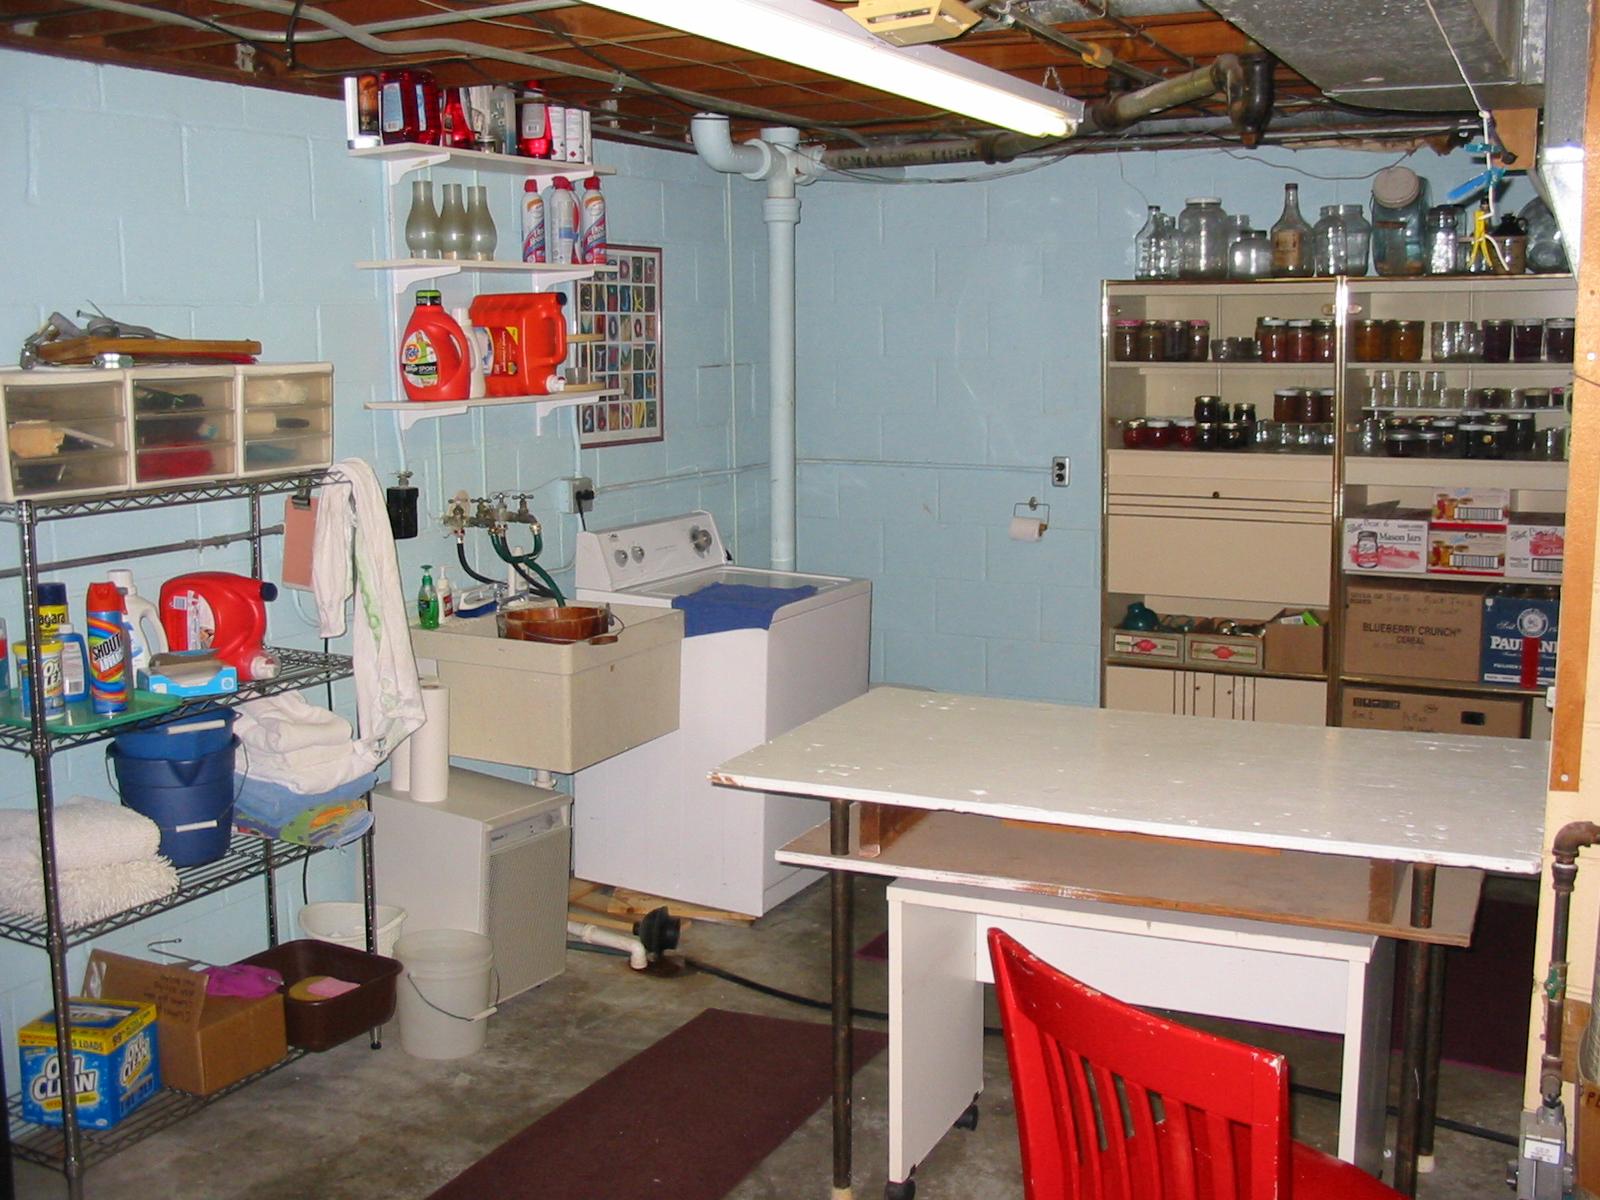 Man Cave Store Omaha : Burdette street house omaha